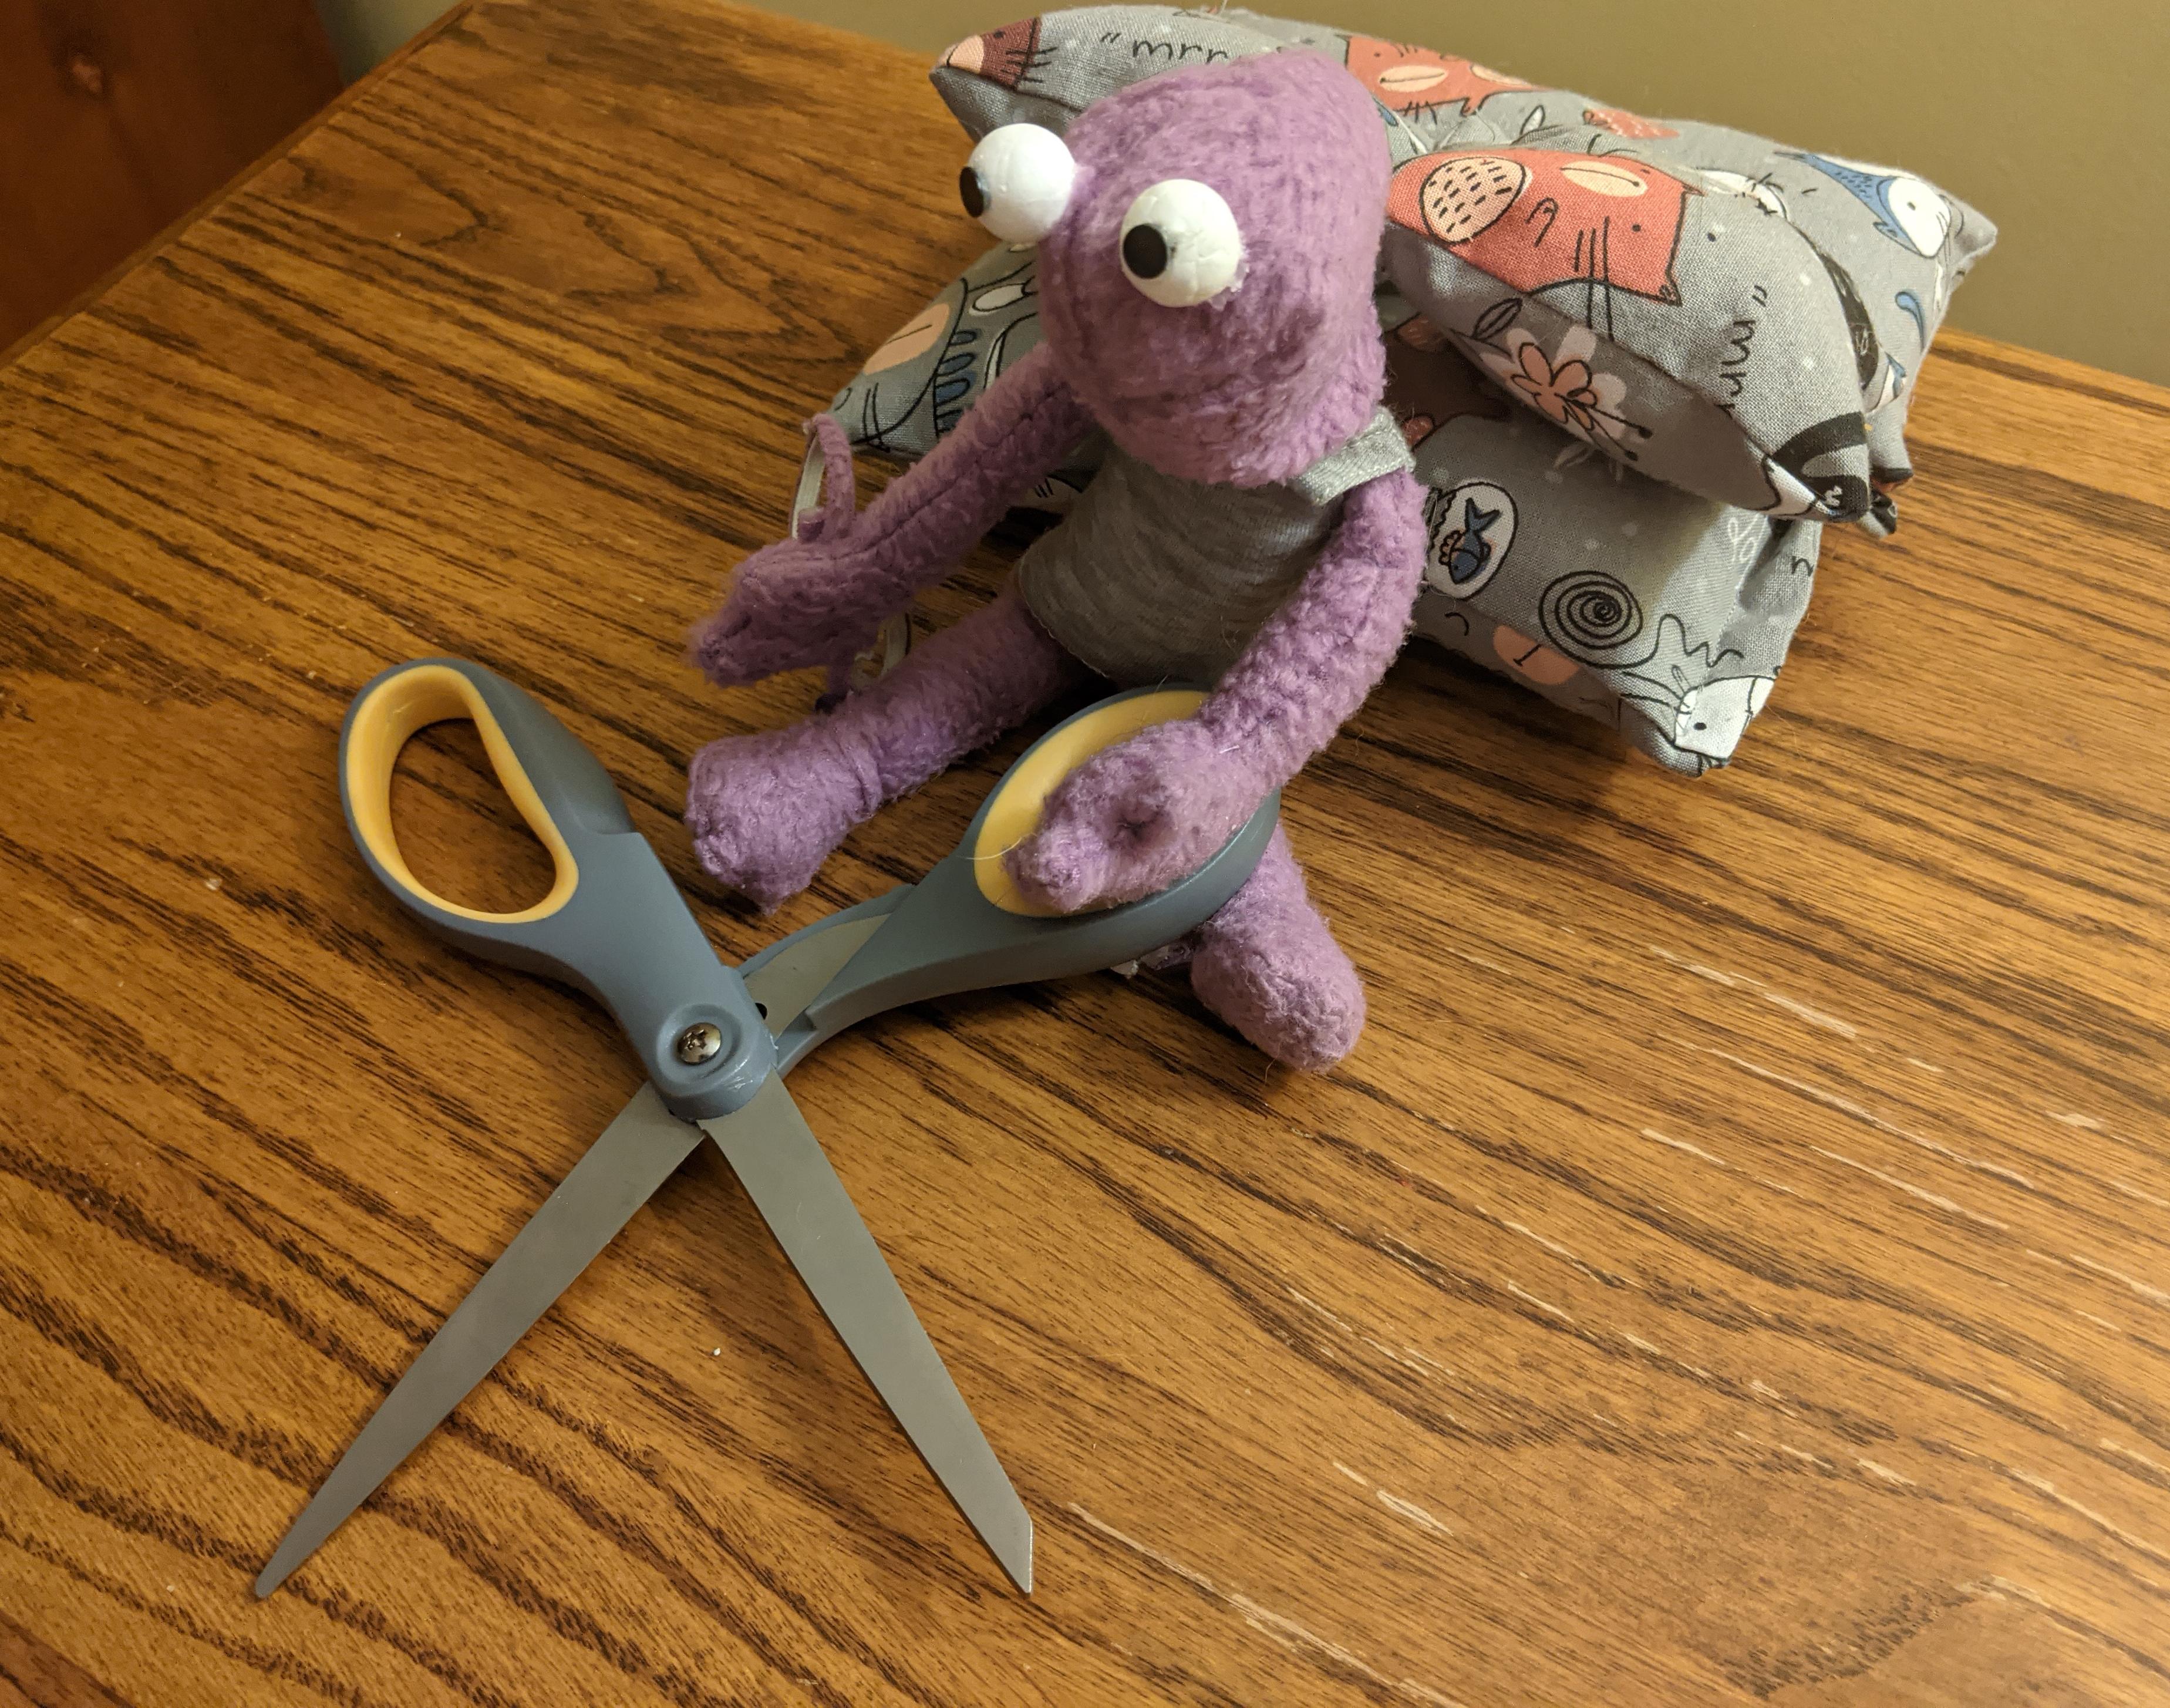 Jab with Scissors